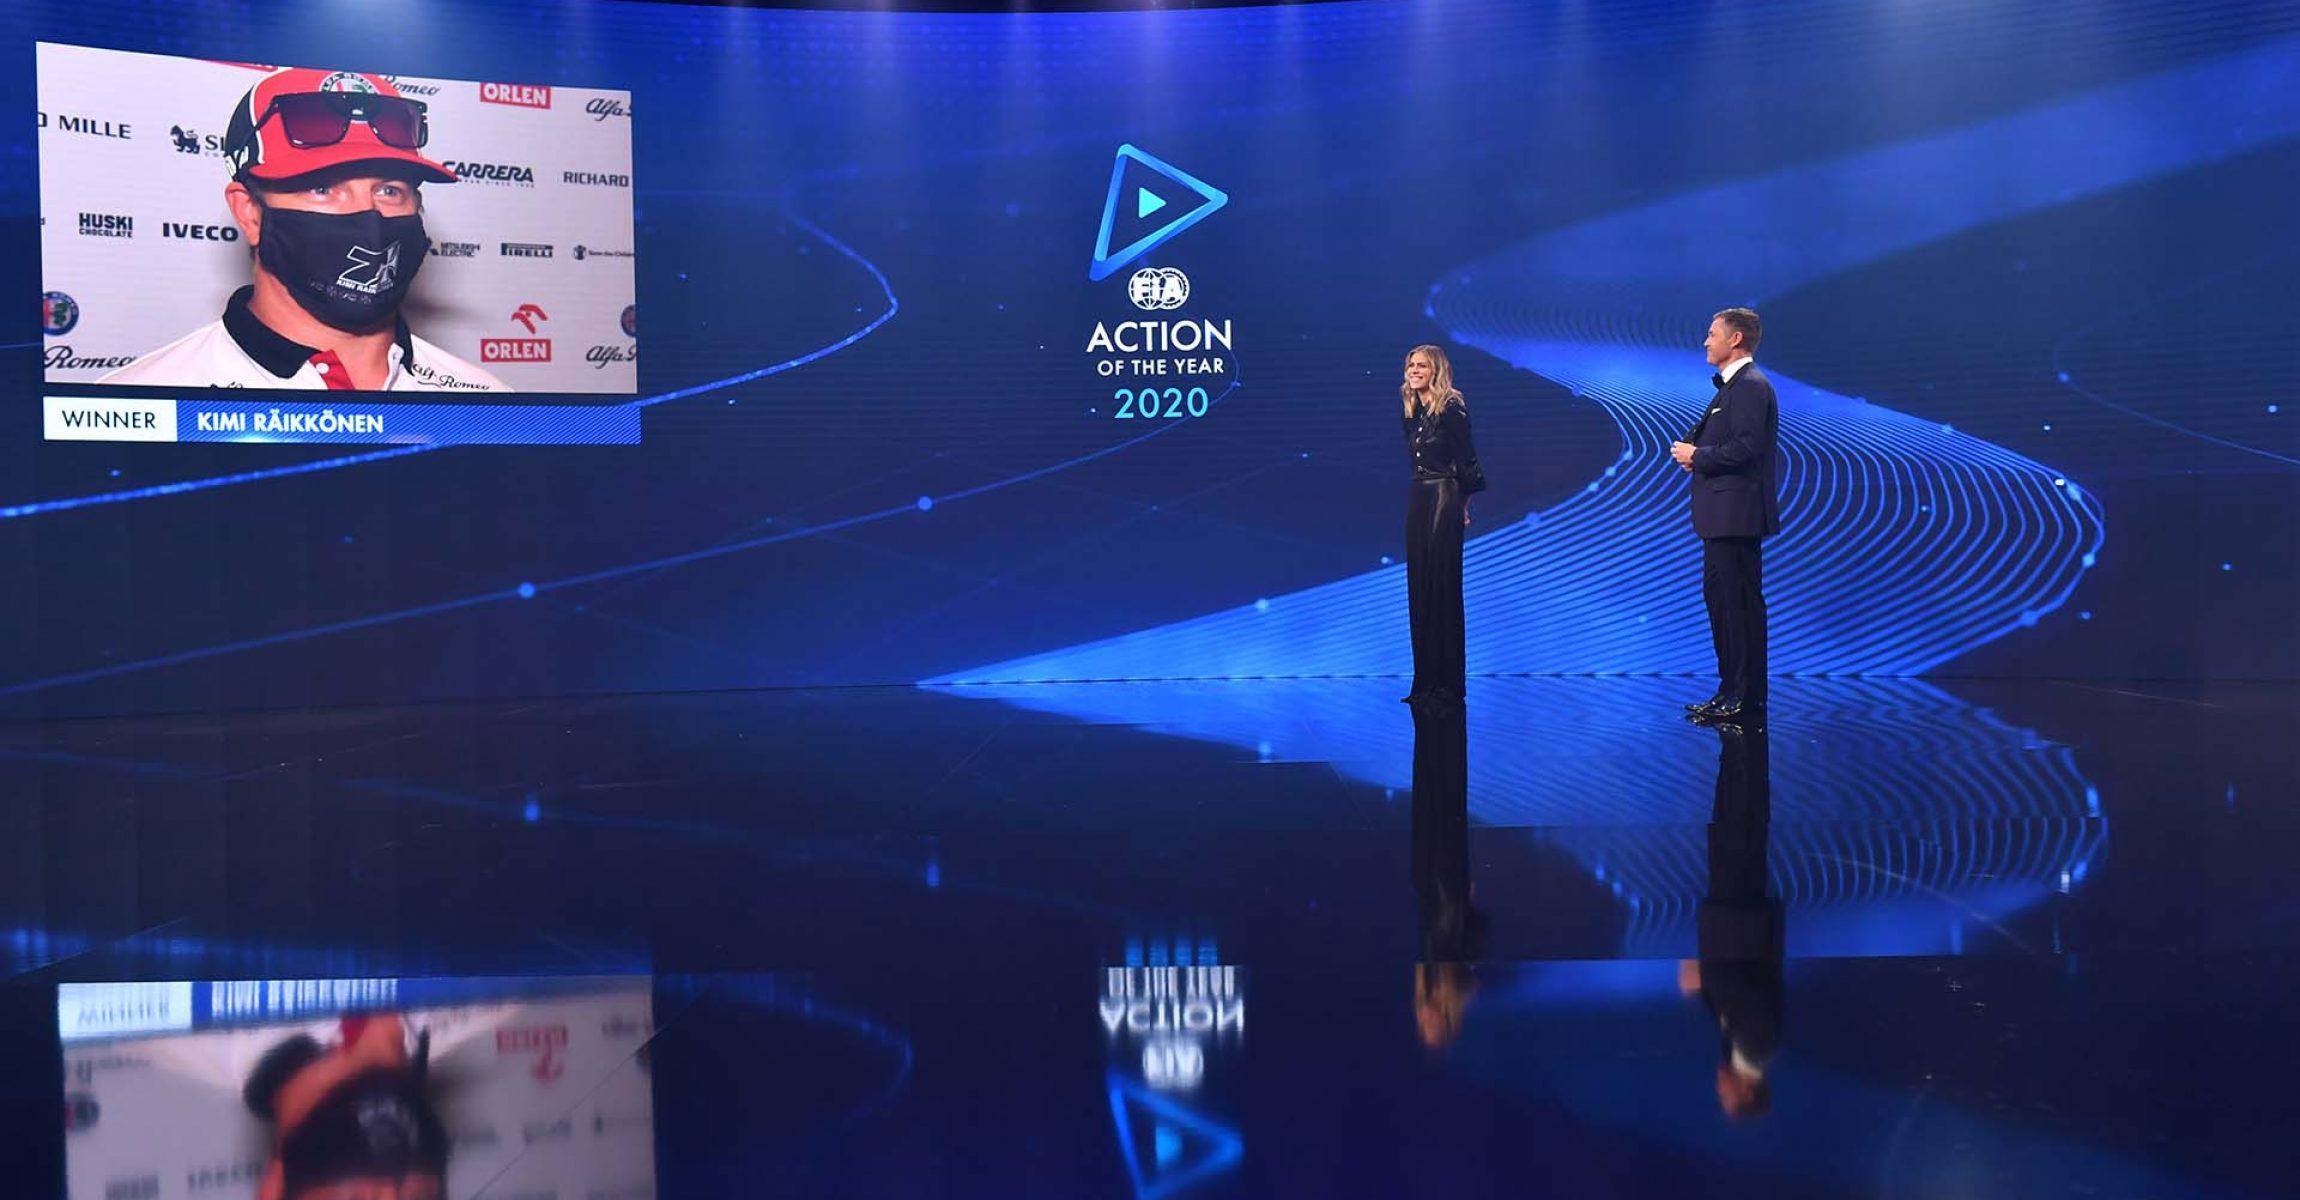 Kimi Räikkönen, FIA Prize Giving Ceremony 2020